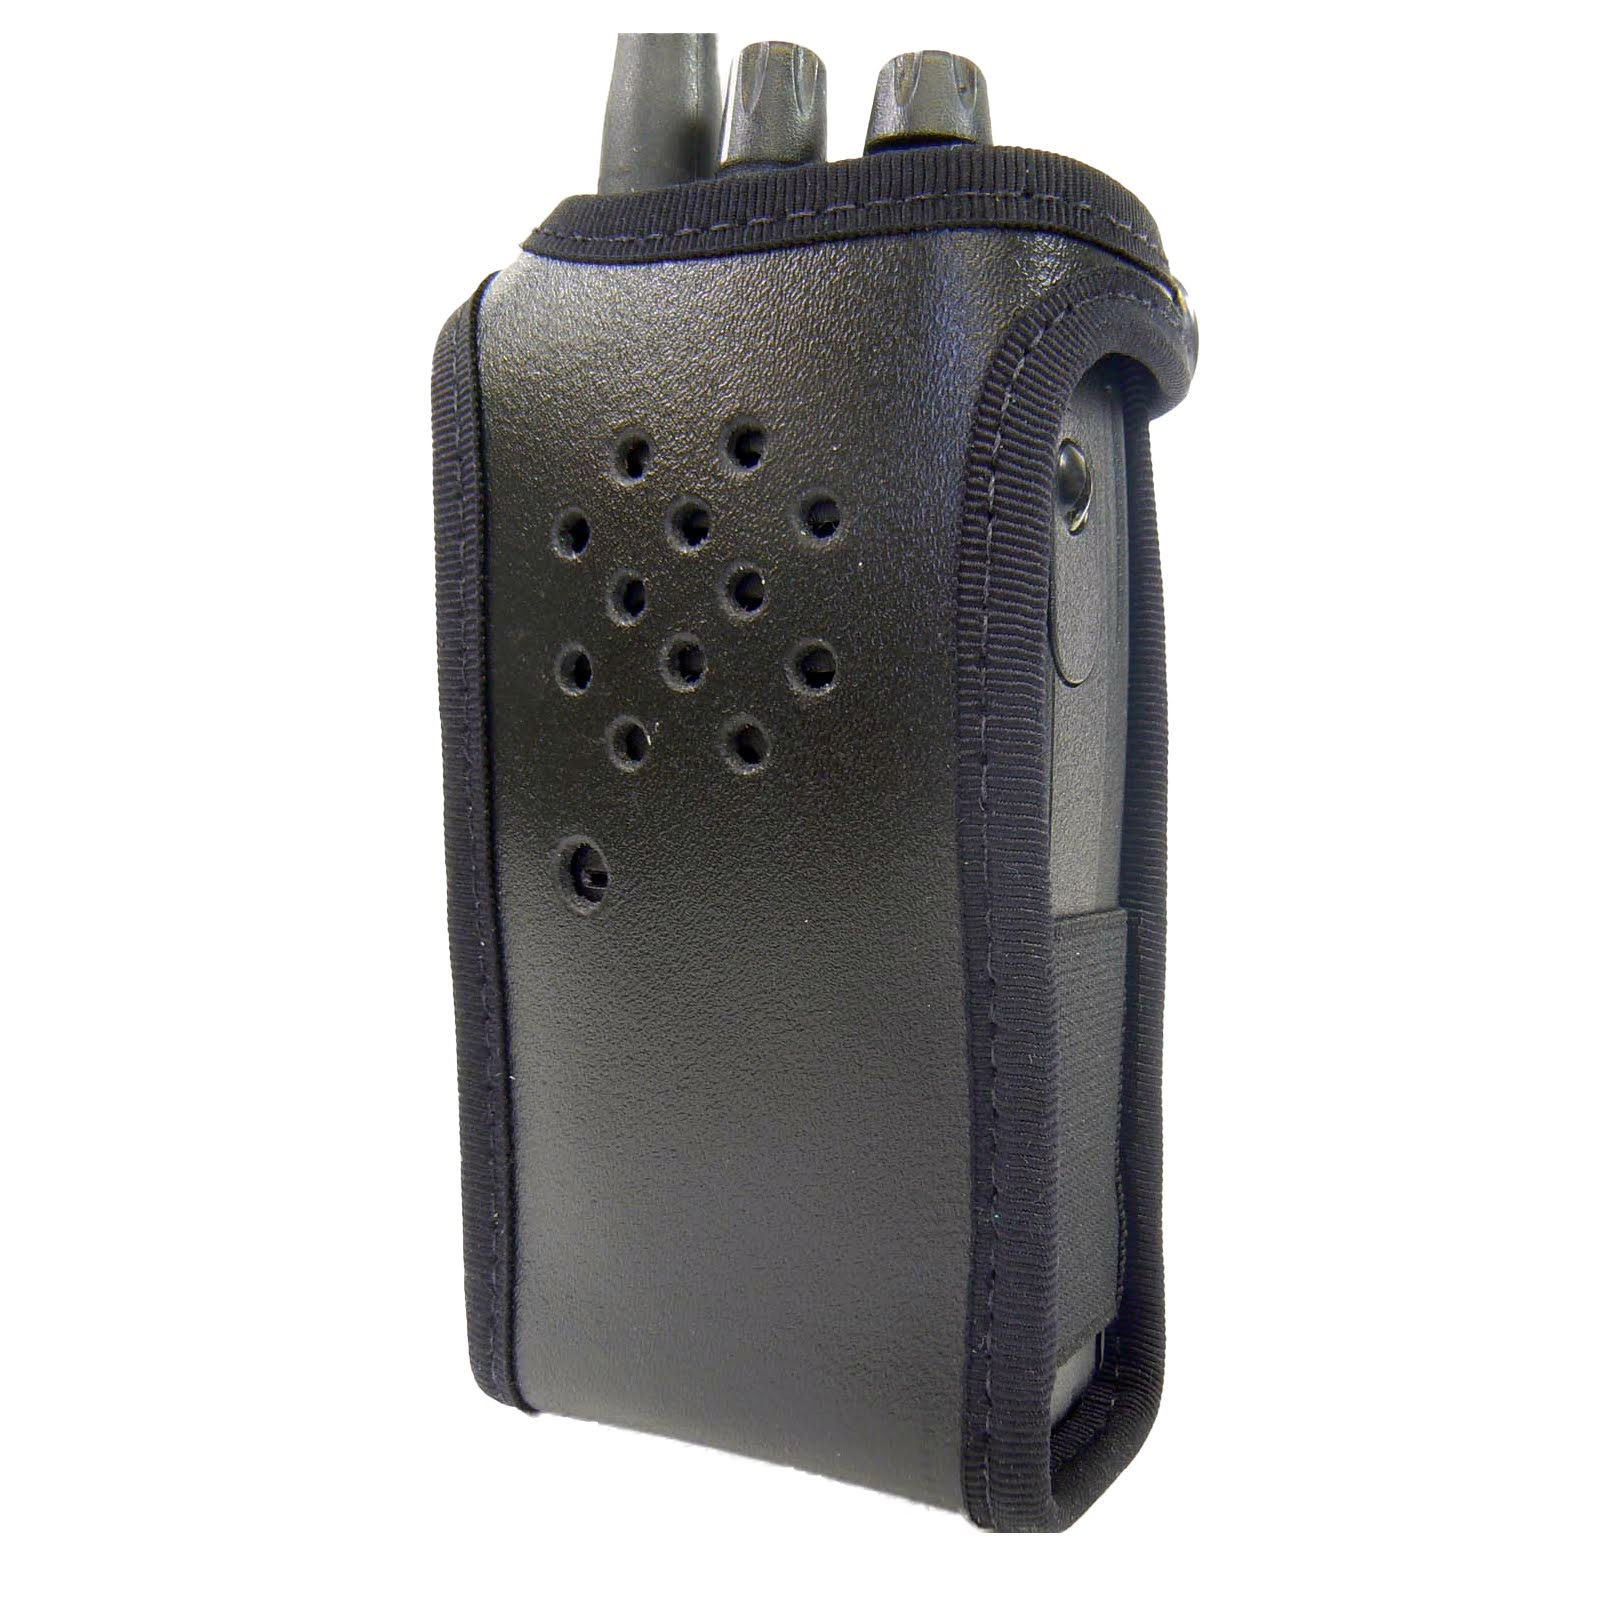 Maxon SL1102 leather radio case